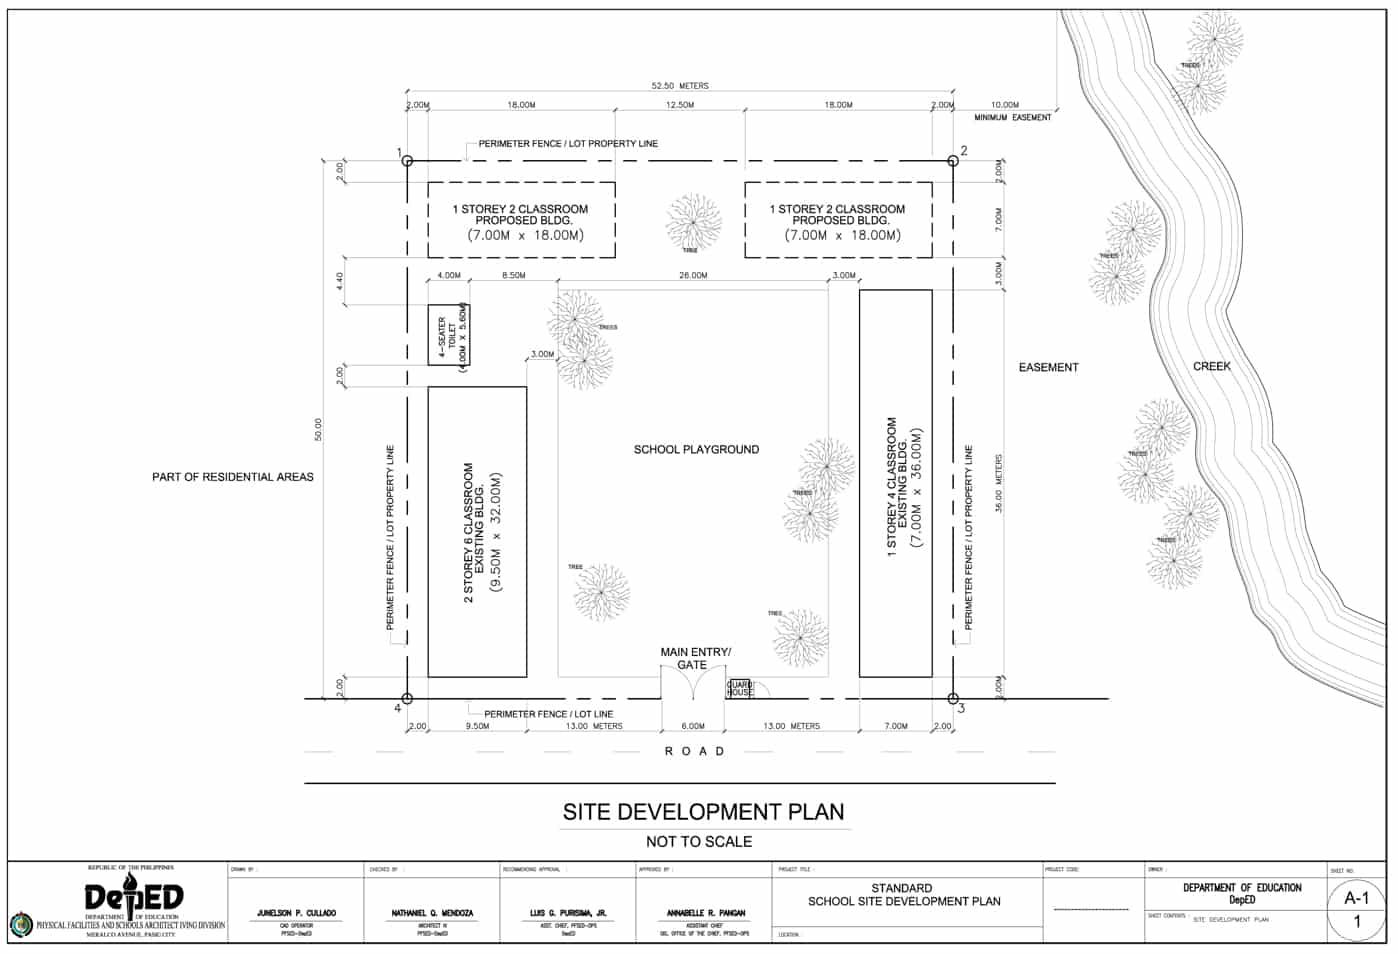 Sample DepEd Site Development Plan